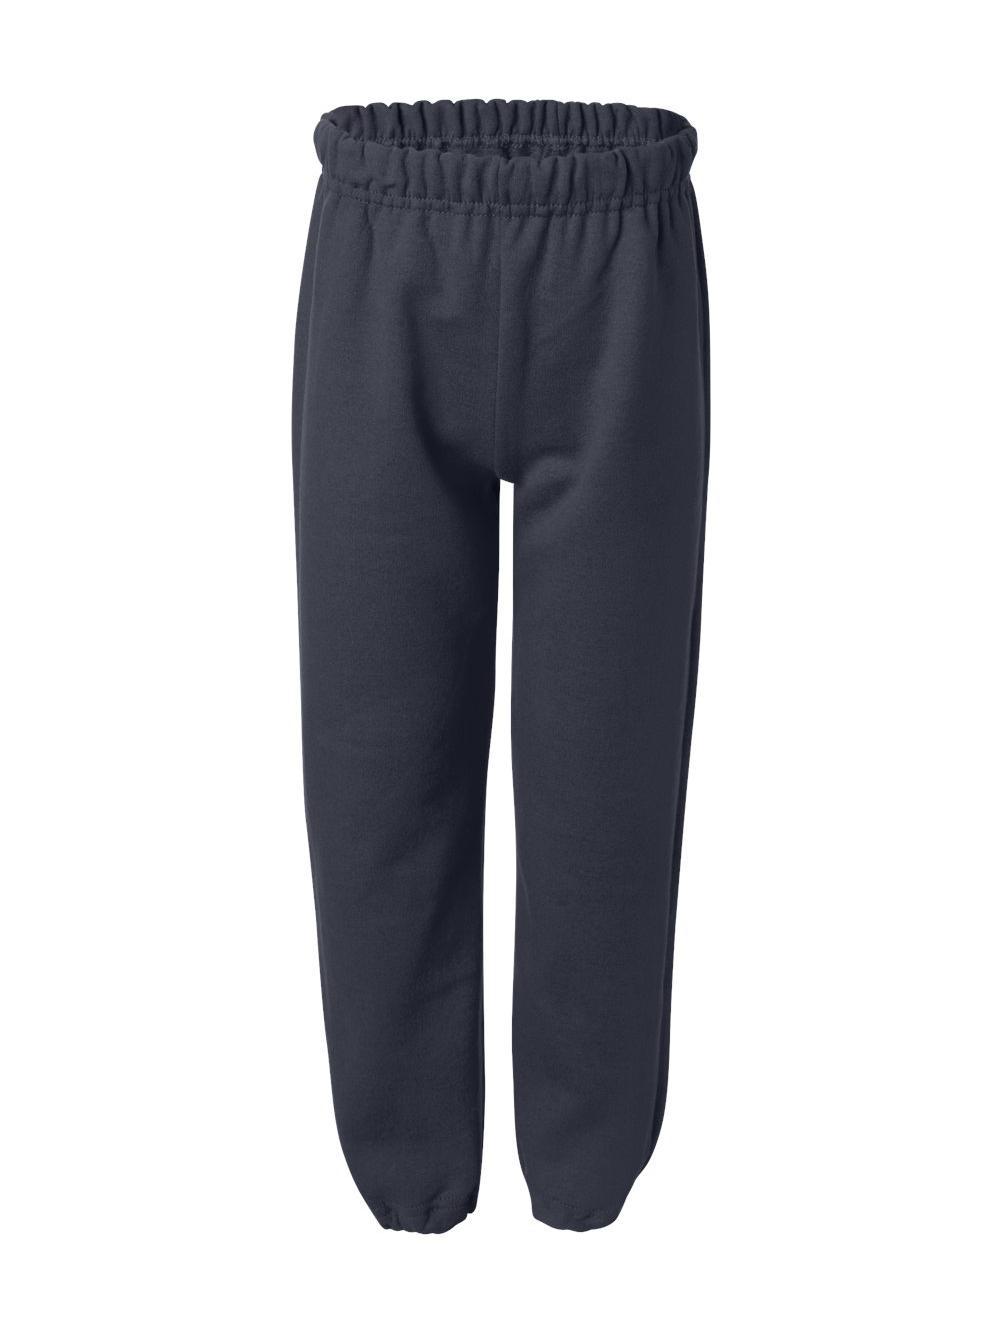 Gildan-Heavy-Blend-Youth-Sweatpants-18200B thumbnail 9